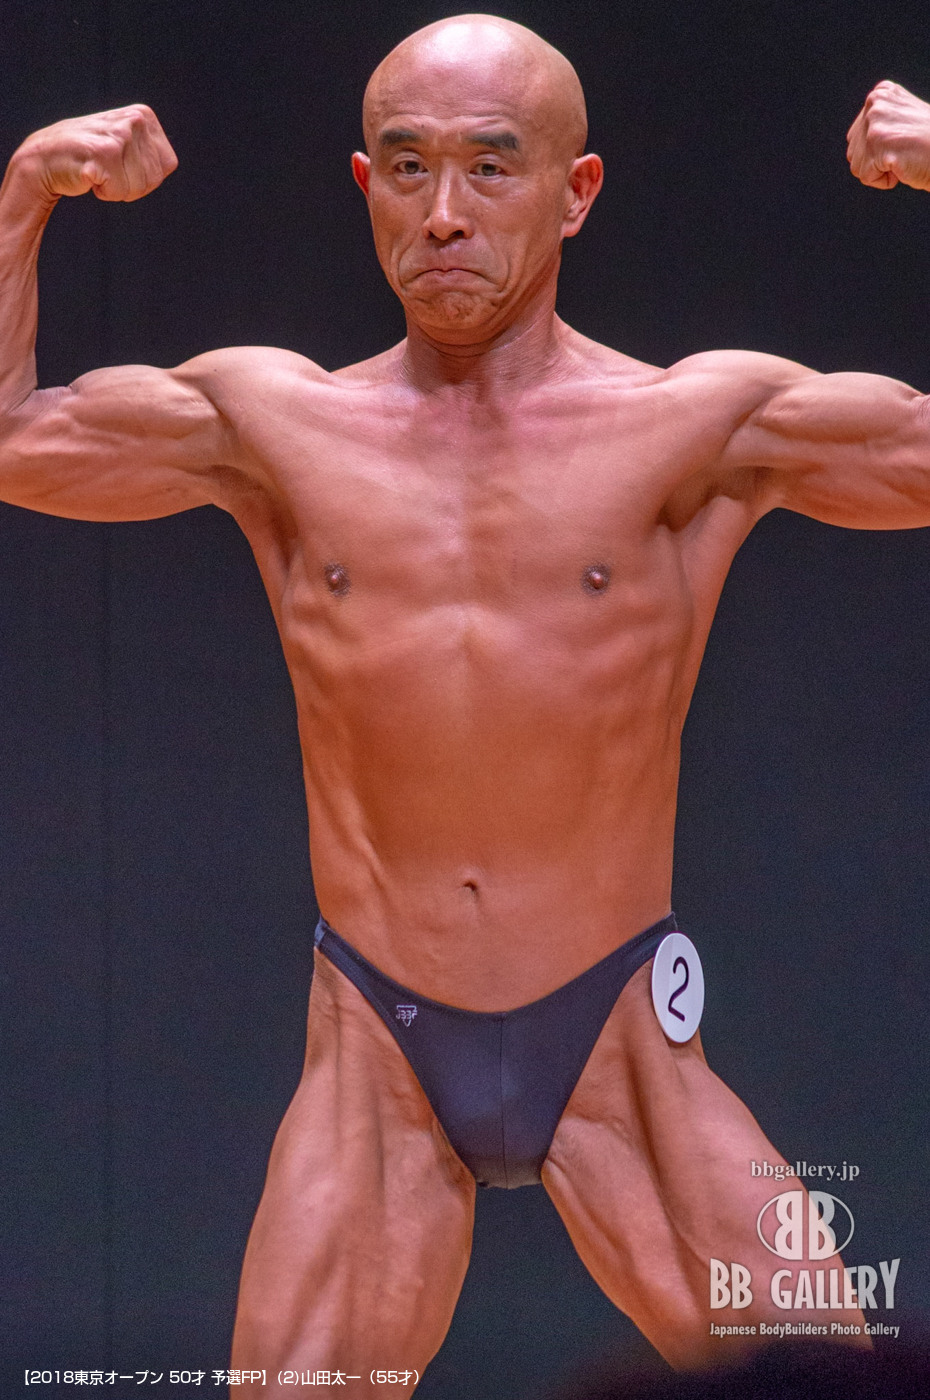 【2018東京オープン 50才 予選FP】(2)山田太一(55才)